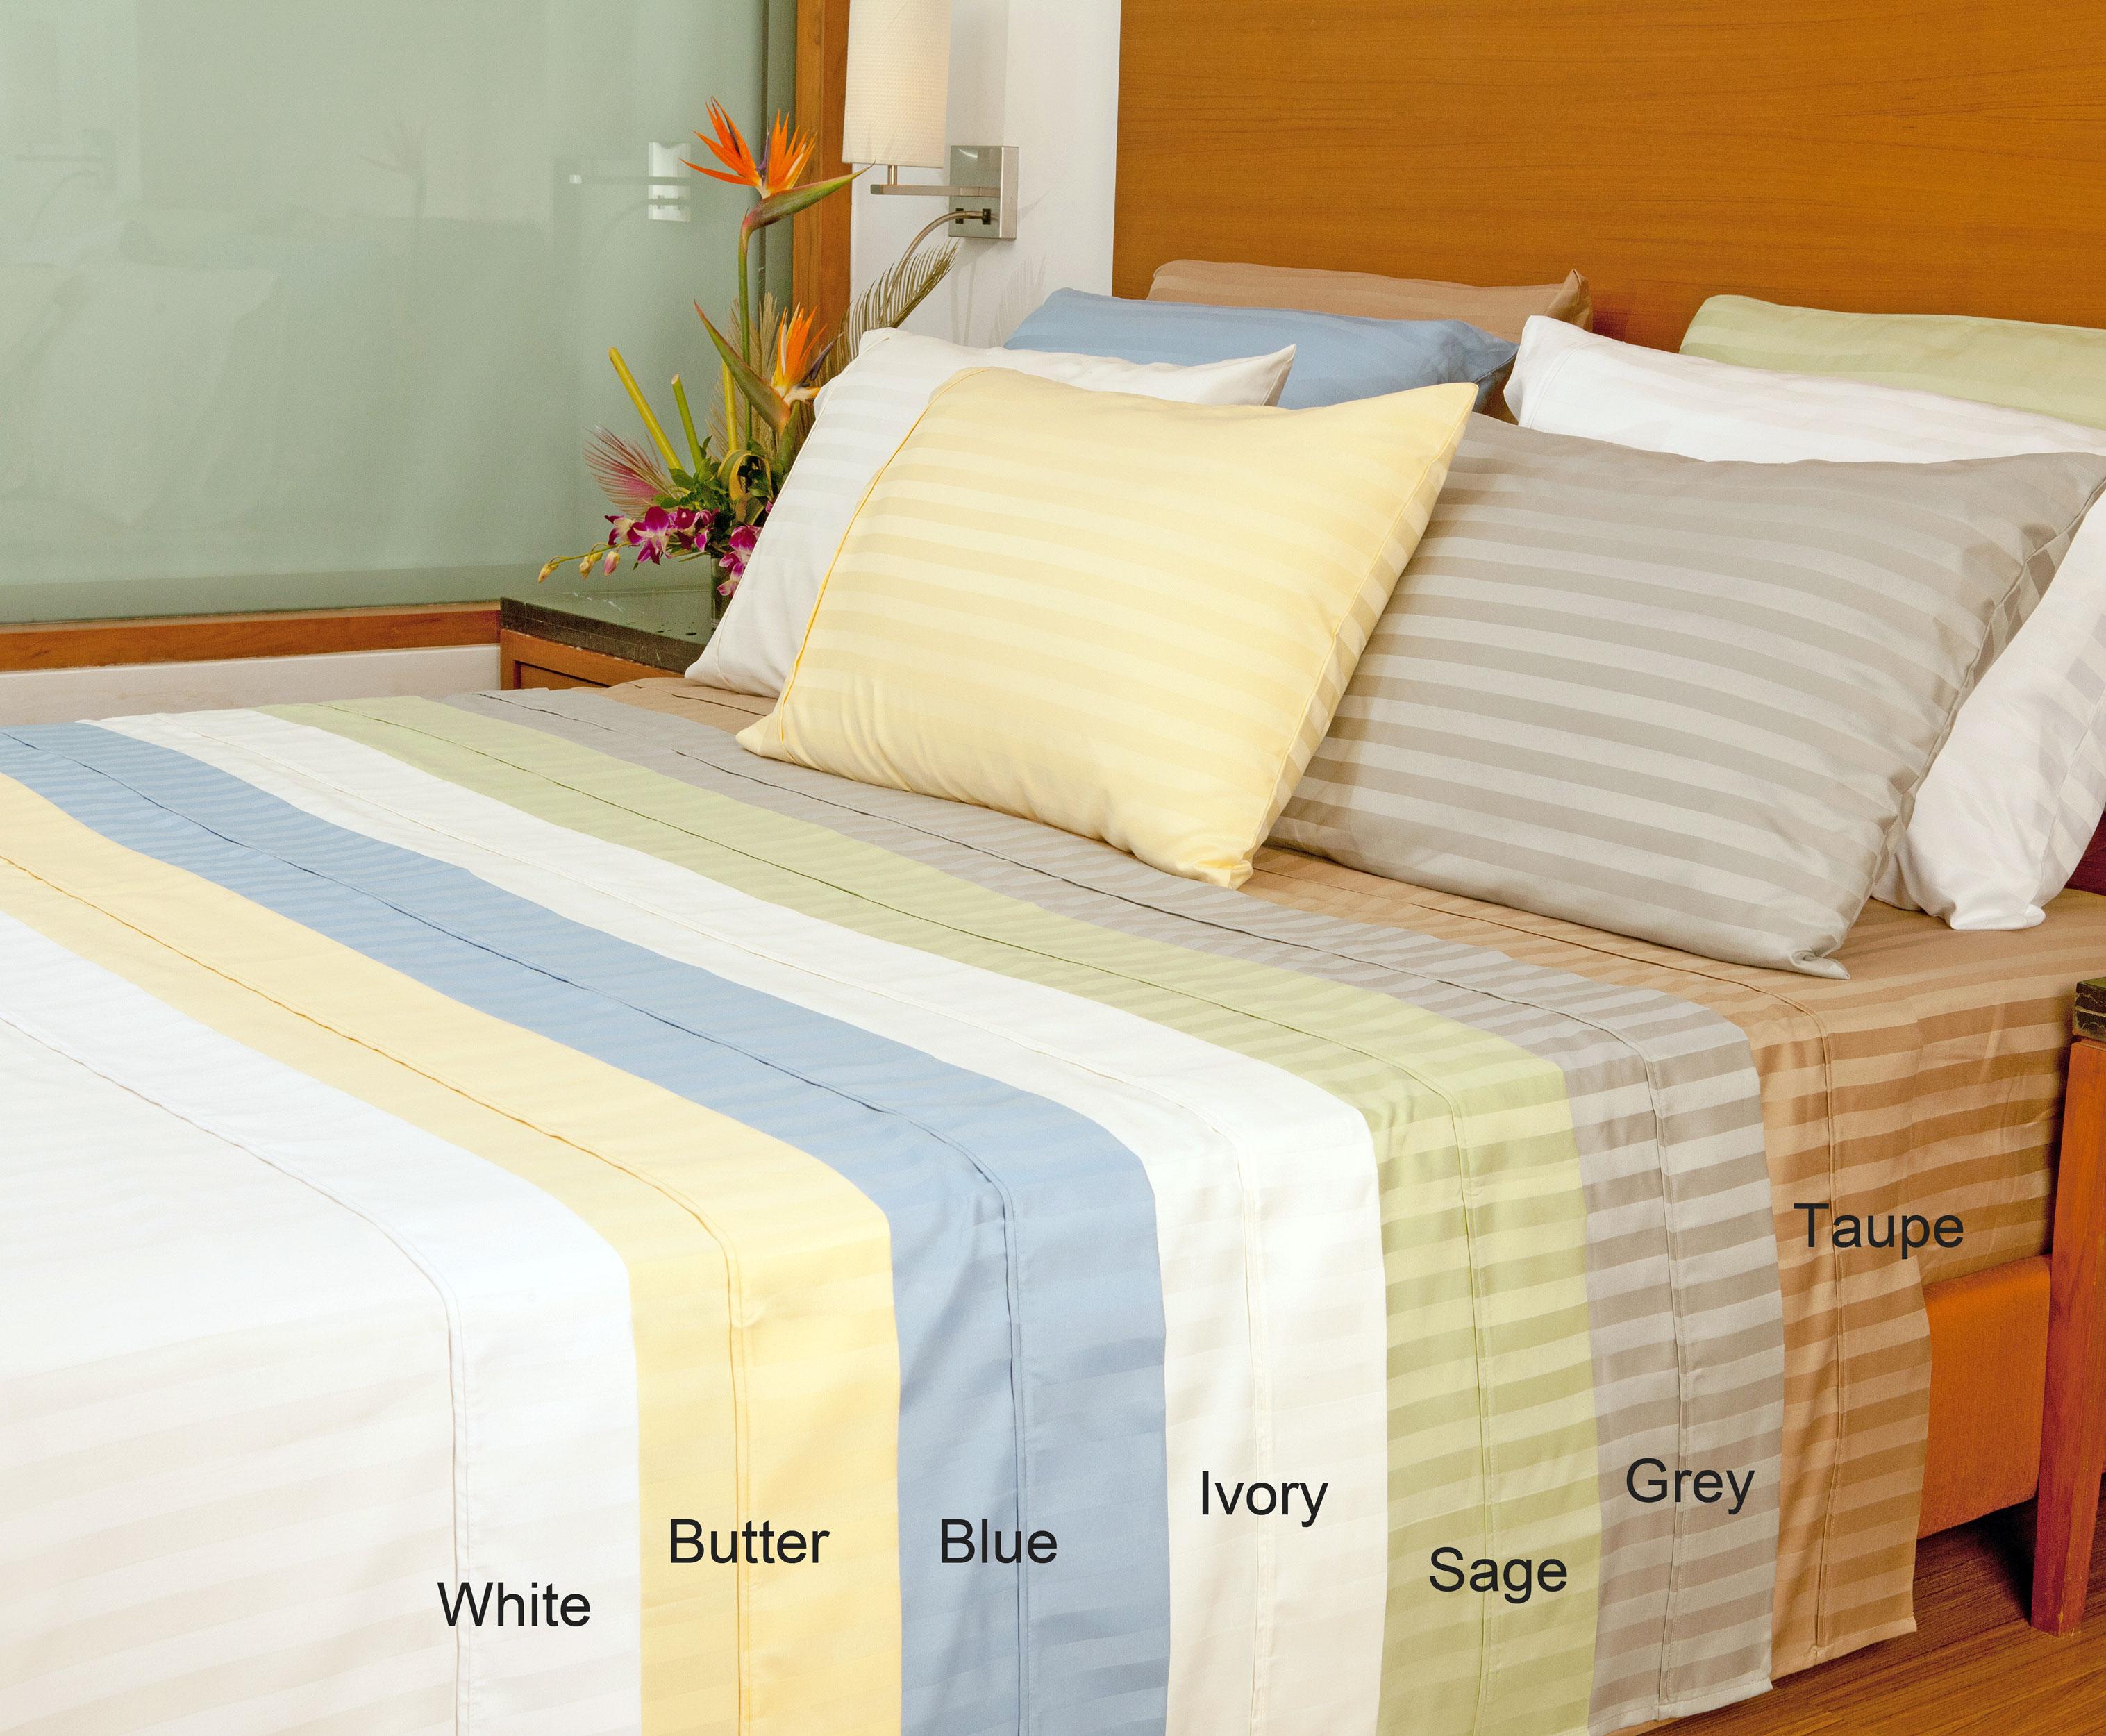 Aspire Linens Striped 1000 Thread Count Easy Care Sheet Set with Bonus Pillowcases (6-piece Set) - Sage at Sears.com